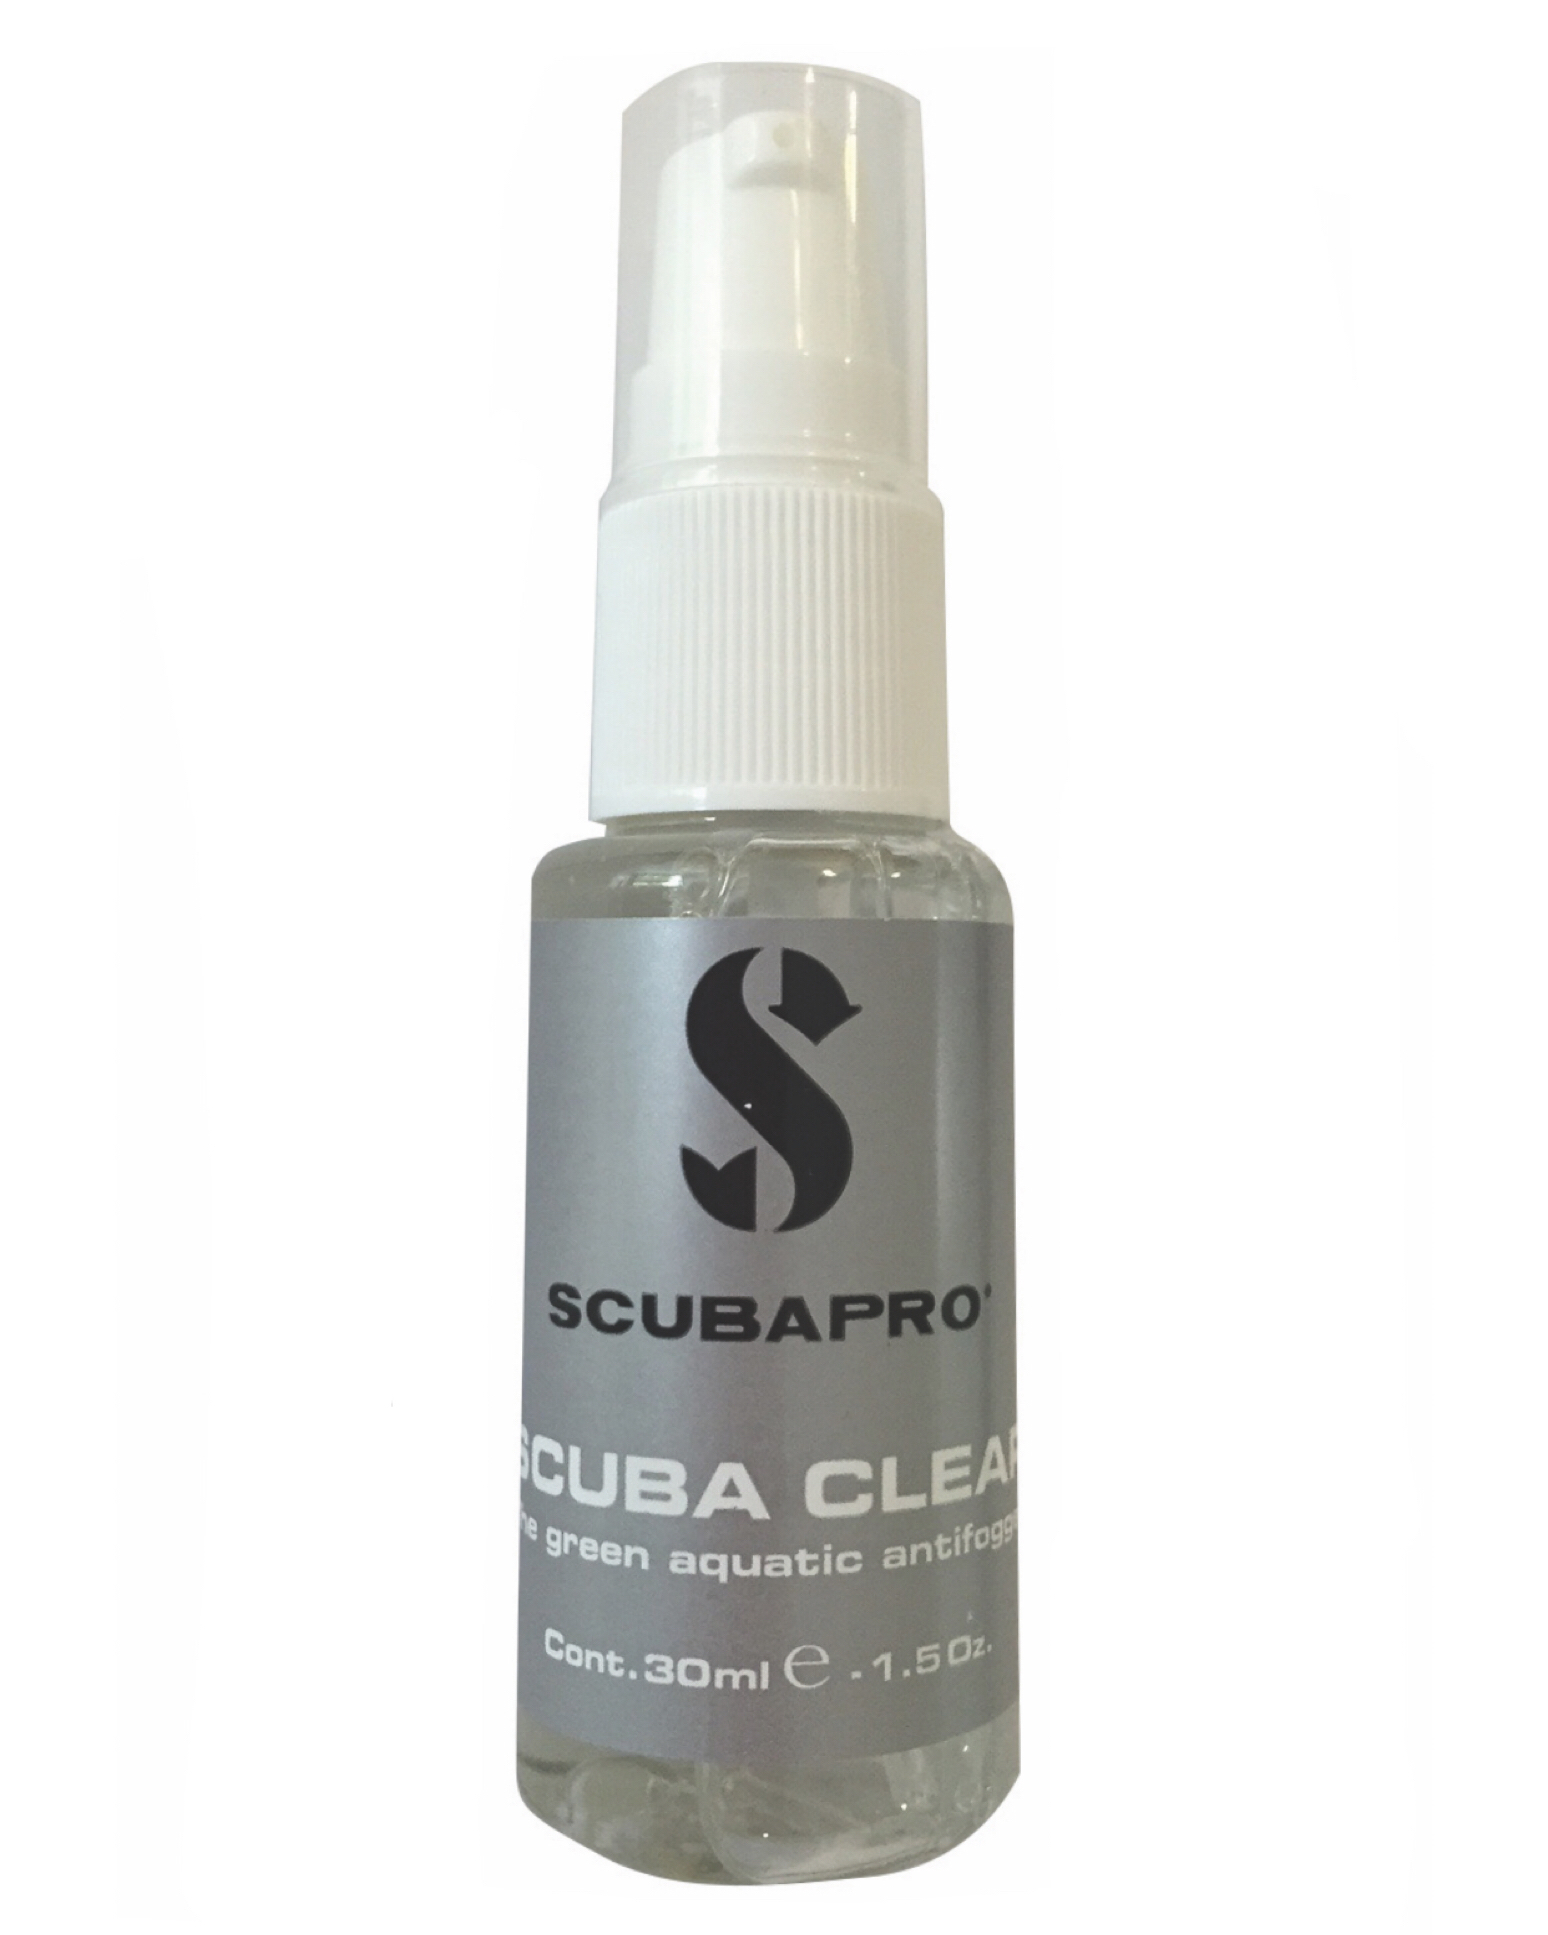 Scubaclear45